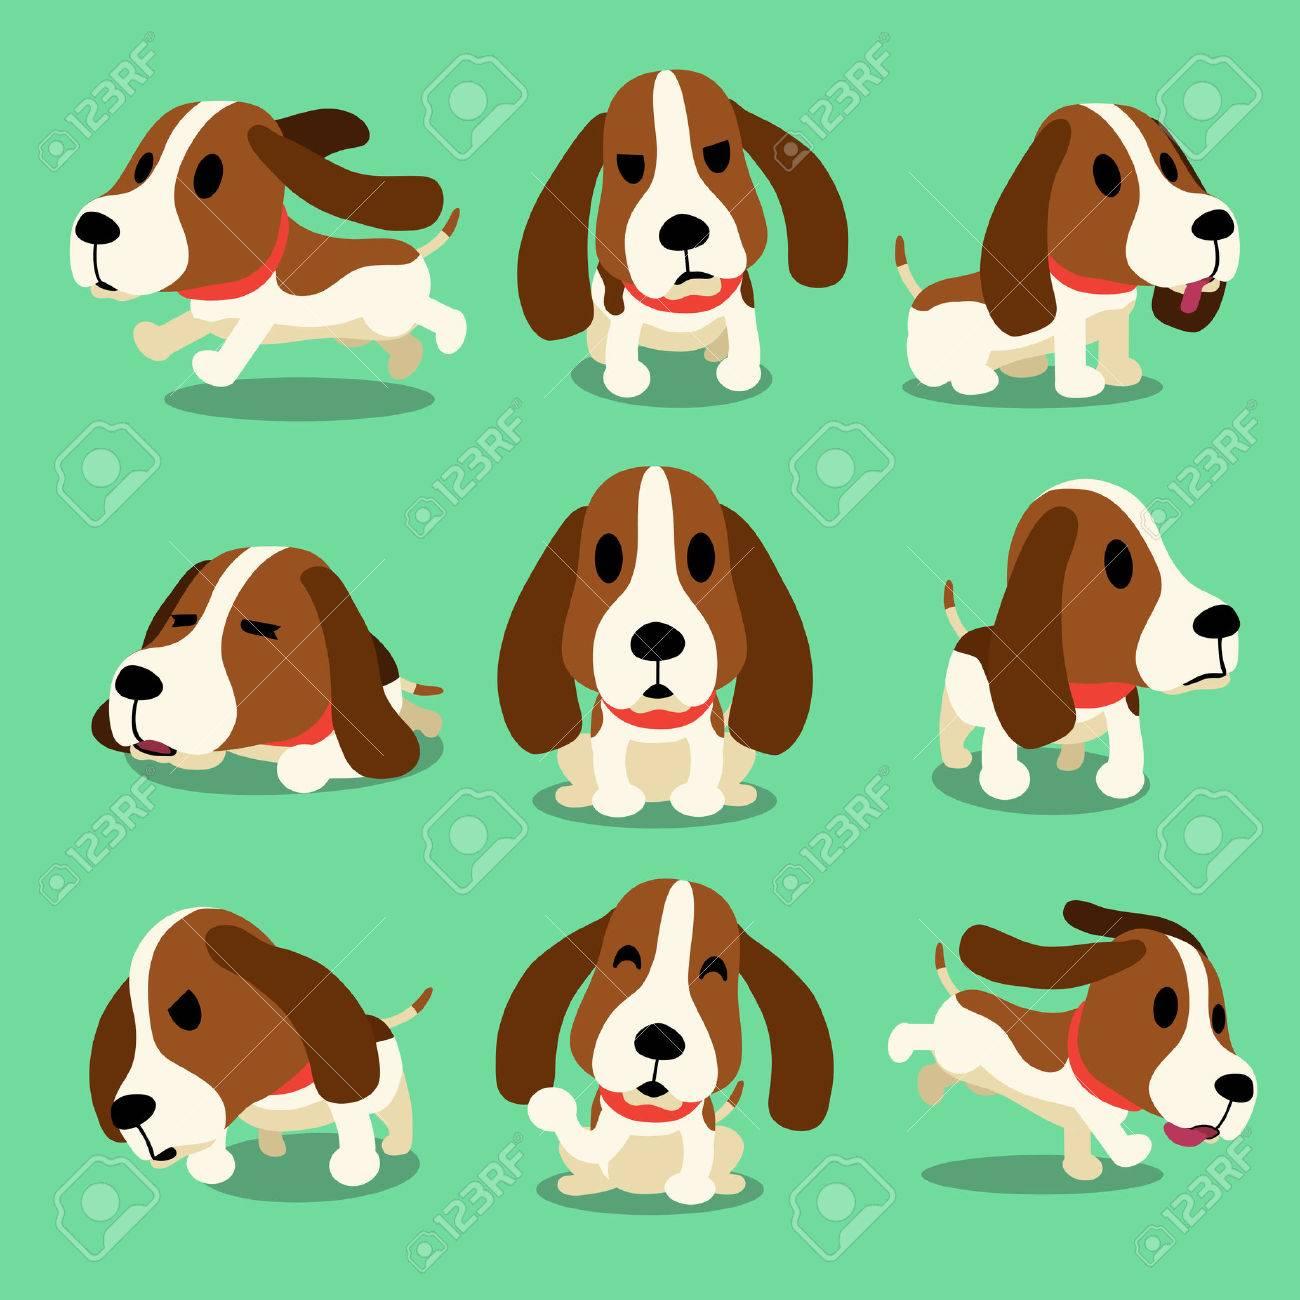 Cartoon character hound dog poses - 50952670